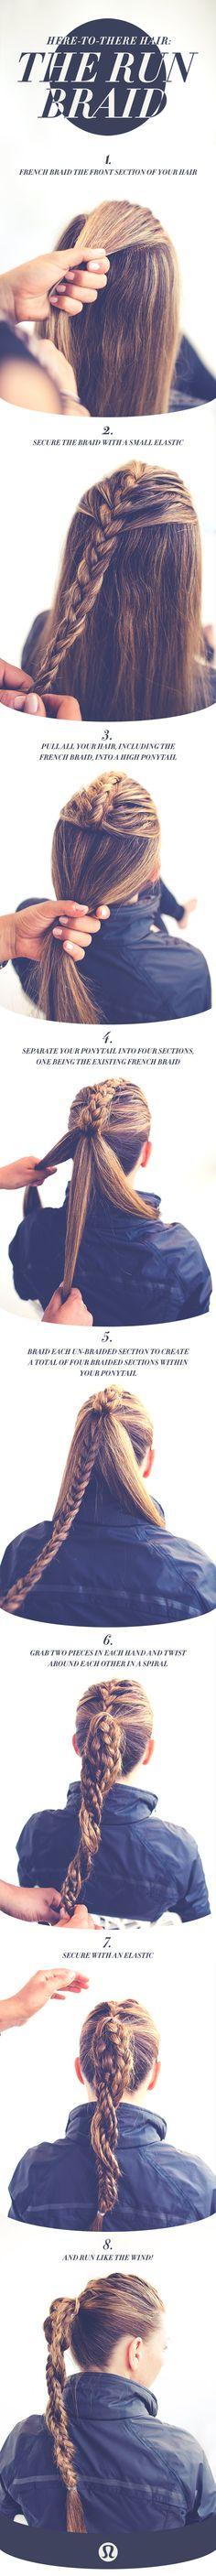 http://blog.lululemon.com/running-hairstyle-braid/?CID=FB_PRO_theRunBraid